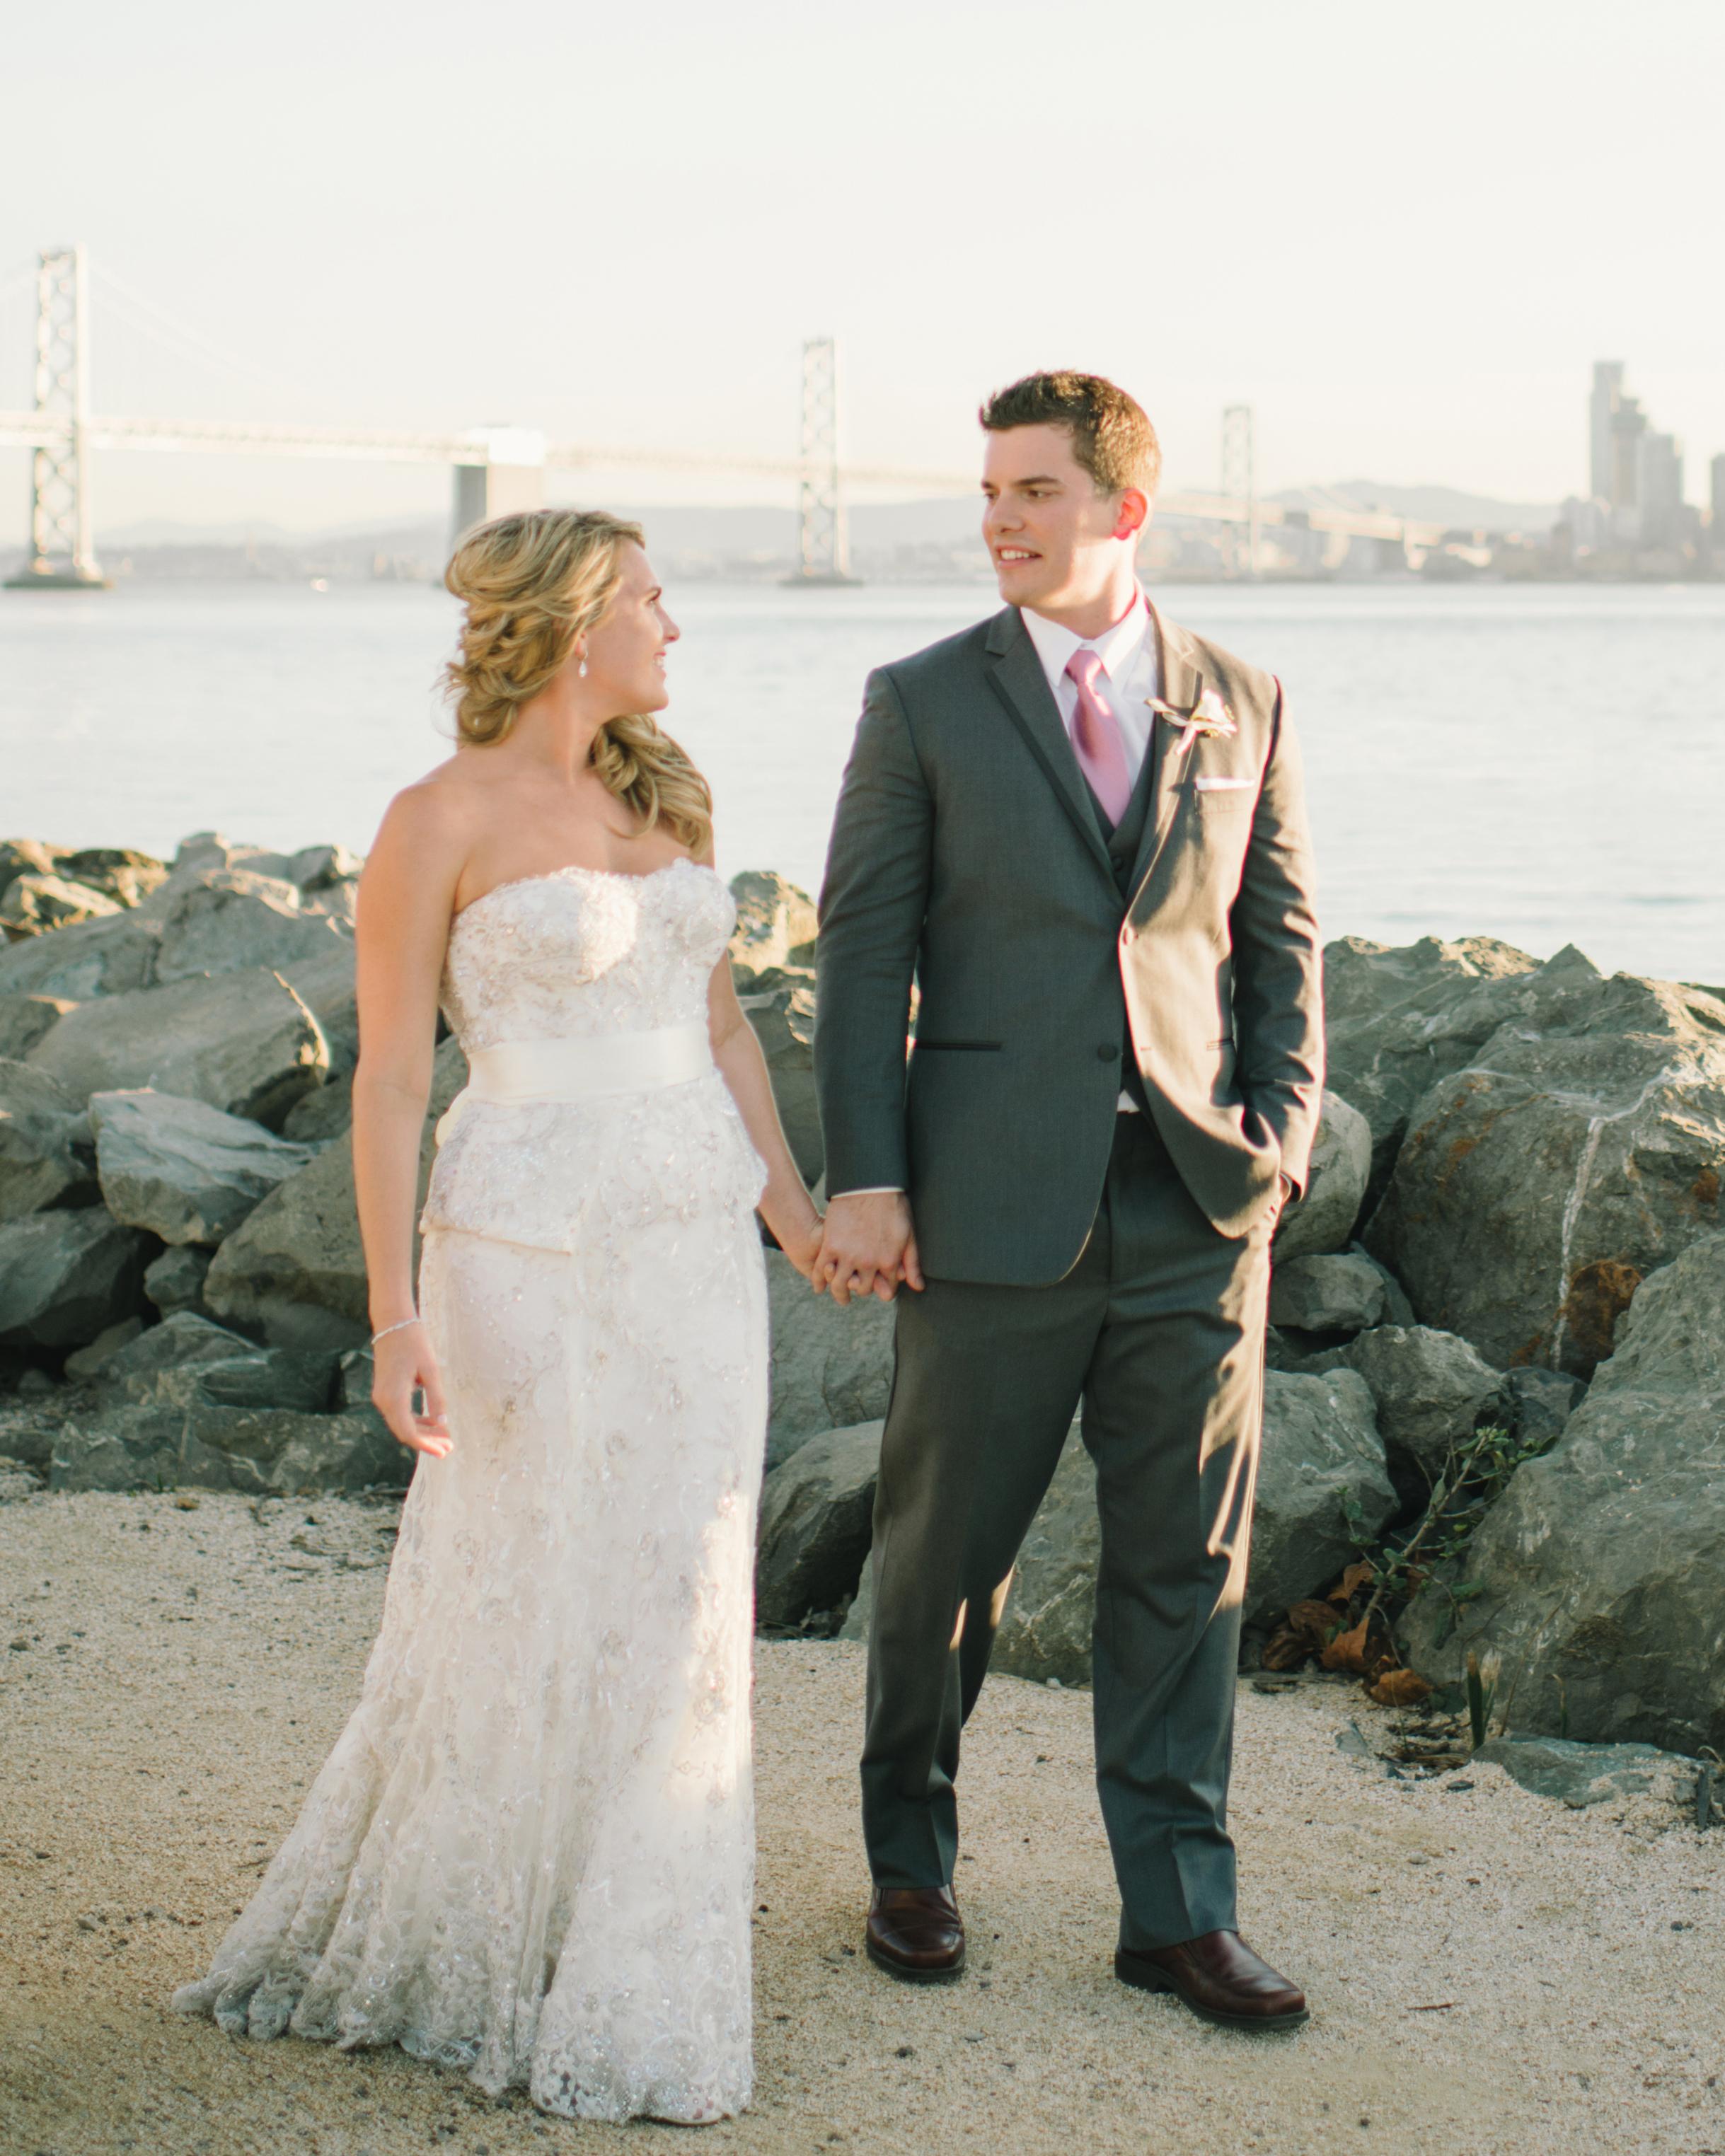 alex-brandon-wedding-portrait6-084-s111338-0714.jpg